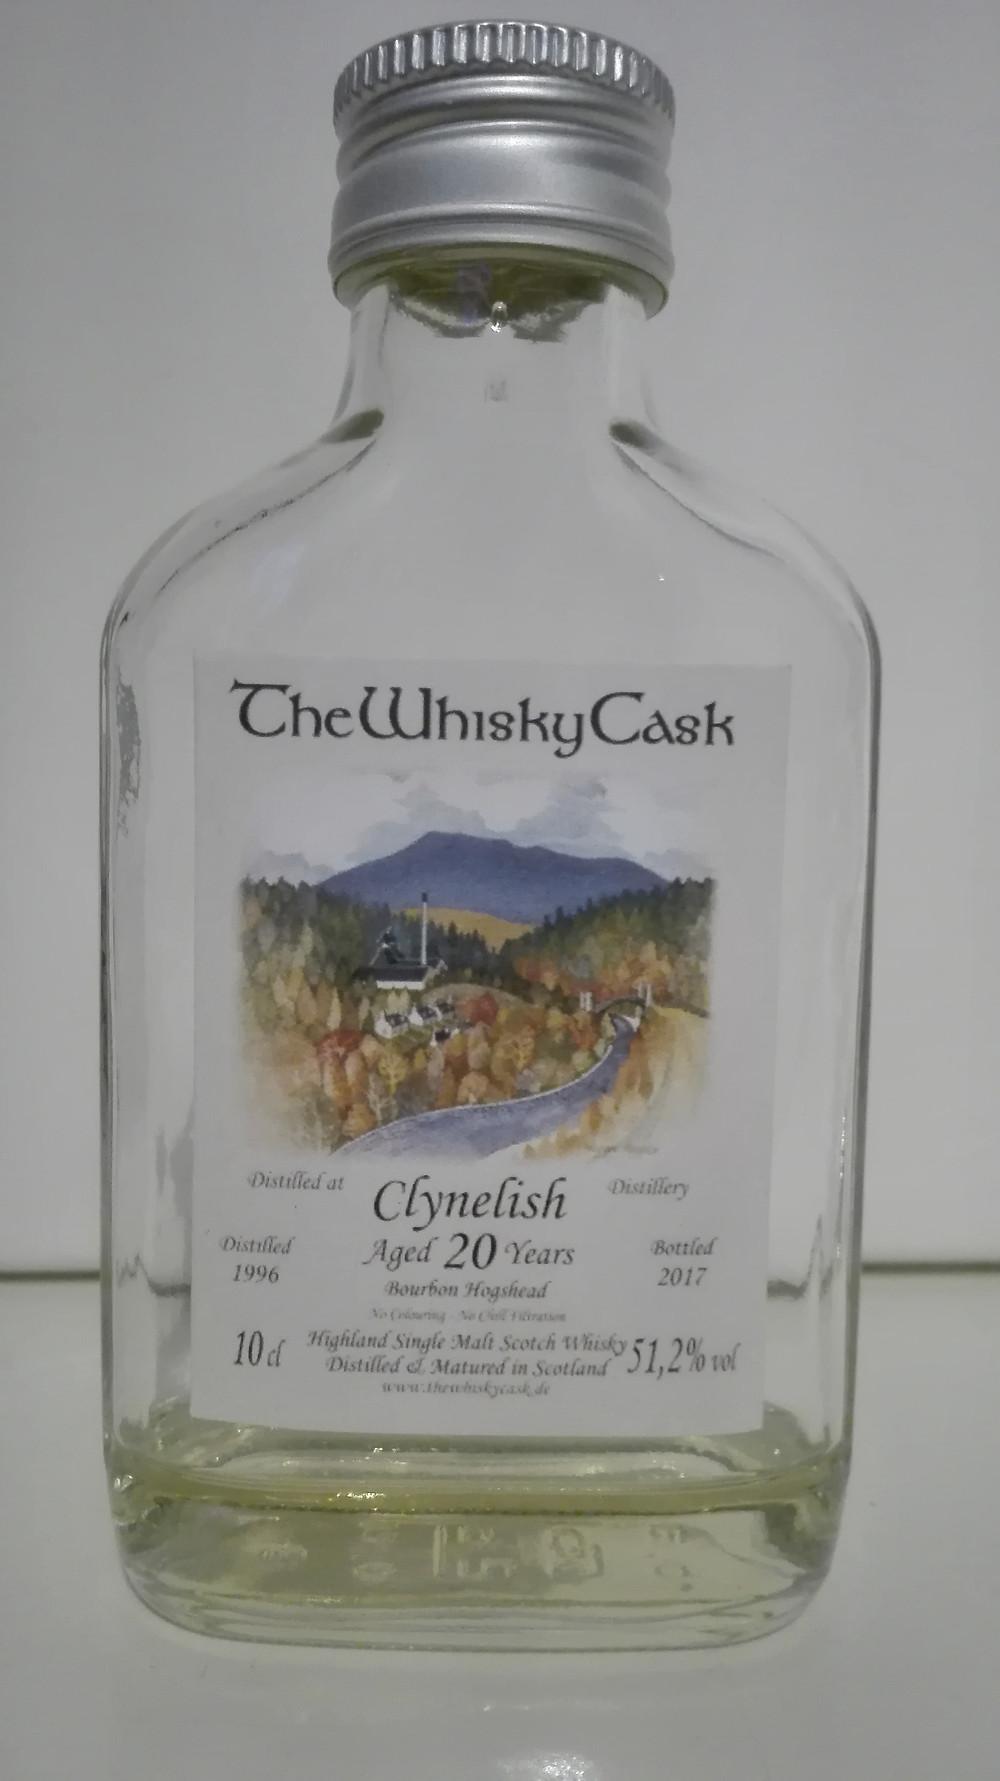 Clynelish 20 Jahre, 20 yrs, fassstark, The Whisky Cask, TWC, Clynelish 1996, Clynelish 2017